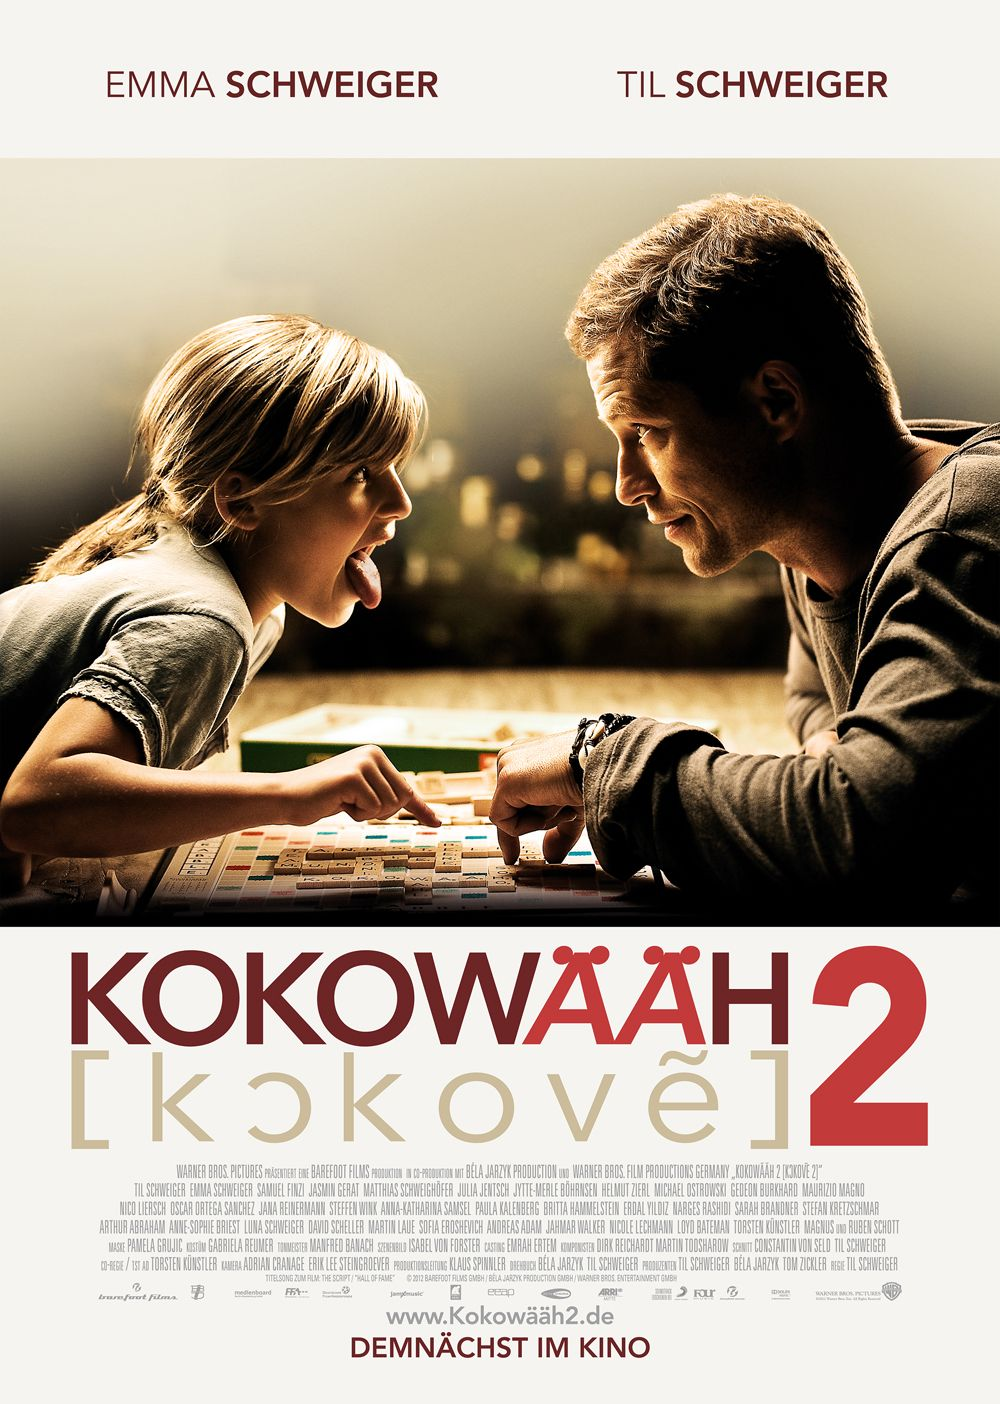 Kokowääh 2 (Til Schweiger, 2013) Filmes, Emma, Dirigida